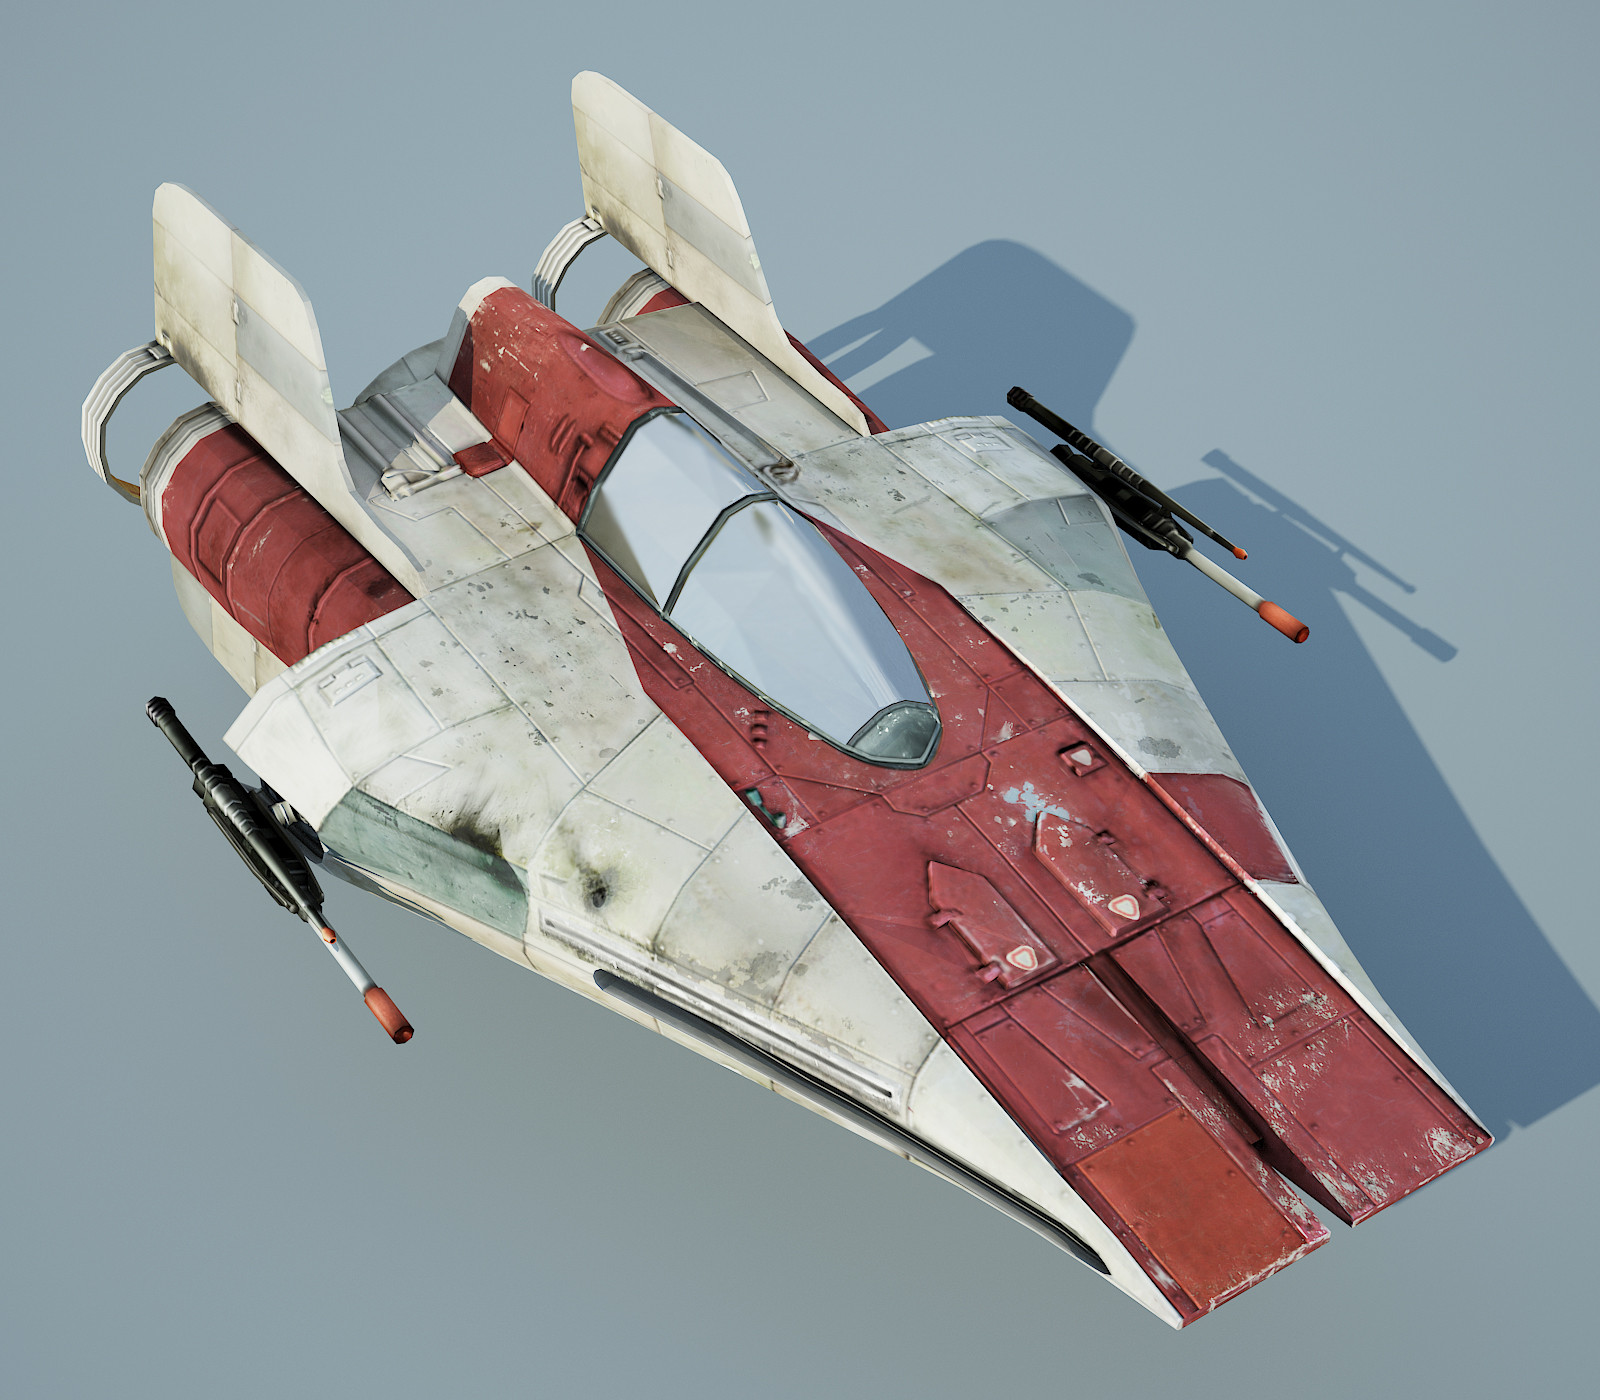 Rz 1 A Wing Interceptor: Star Wars A Wing Starfighter Max